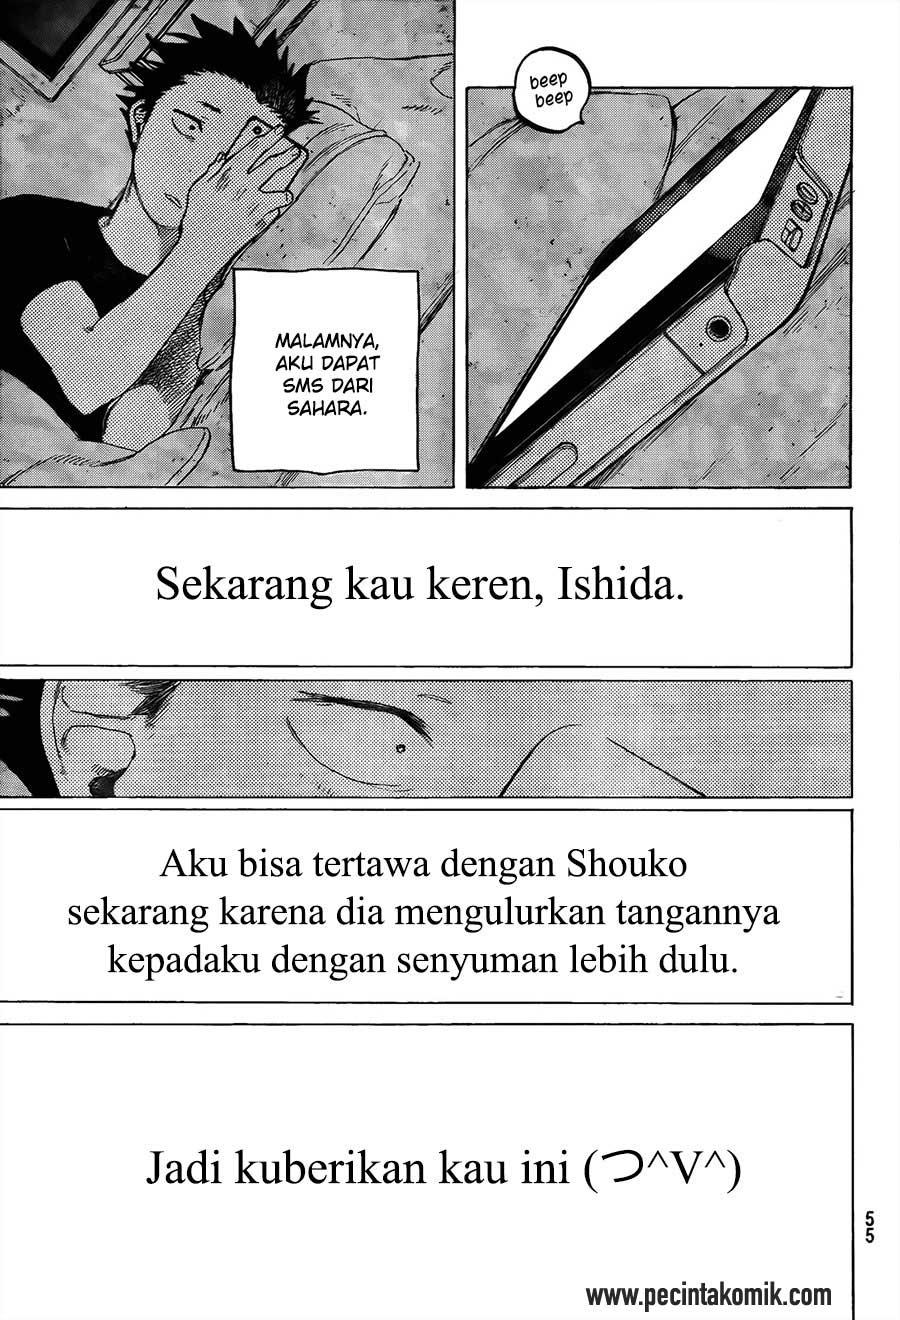 Koe no Katachi Chapter 17-20